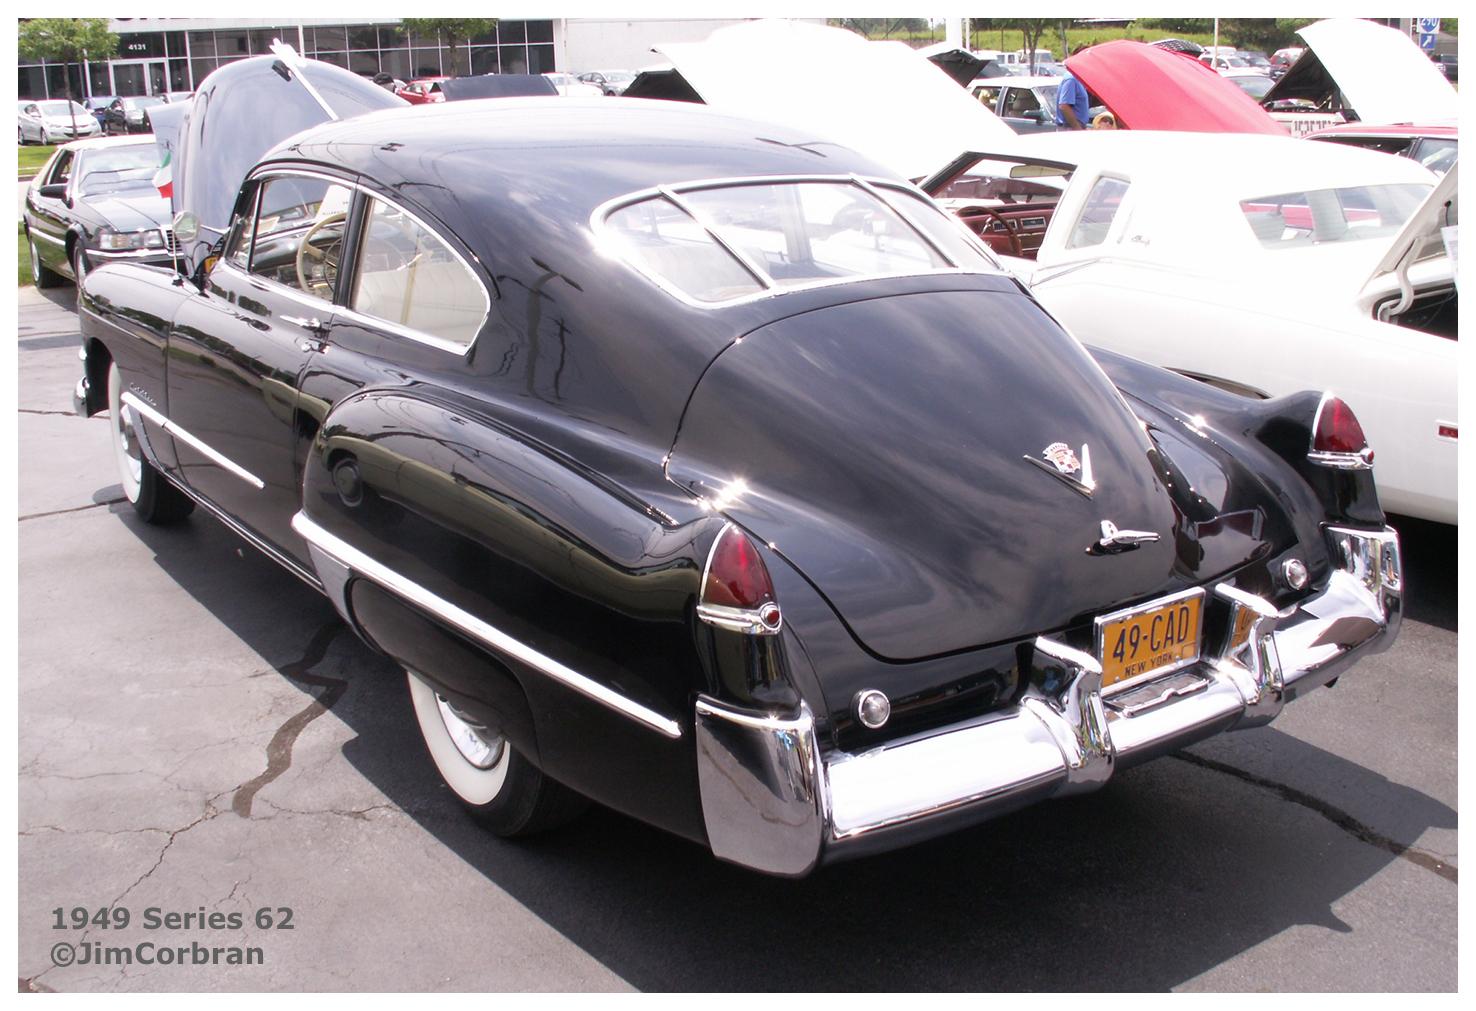 THE CADILLAC OF CAR SHOWS Th Annual CadillacLaSalle Show - Buffalo car show